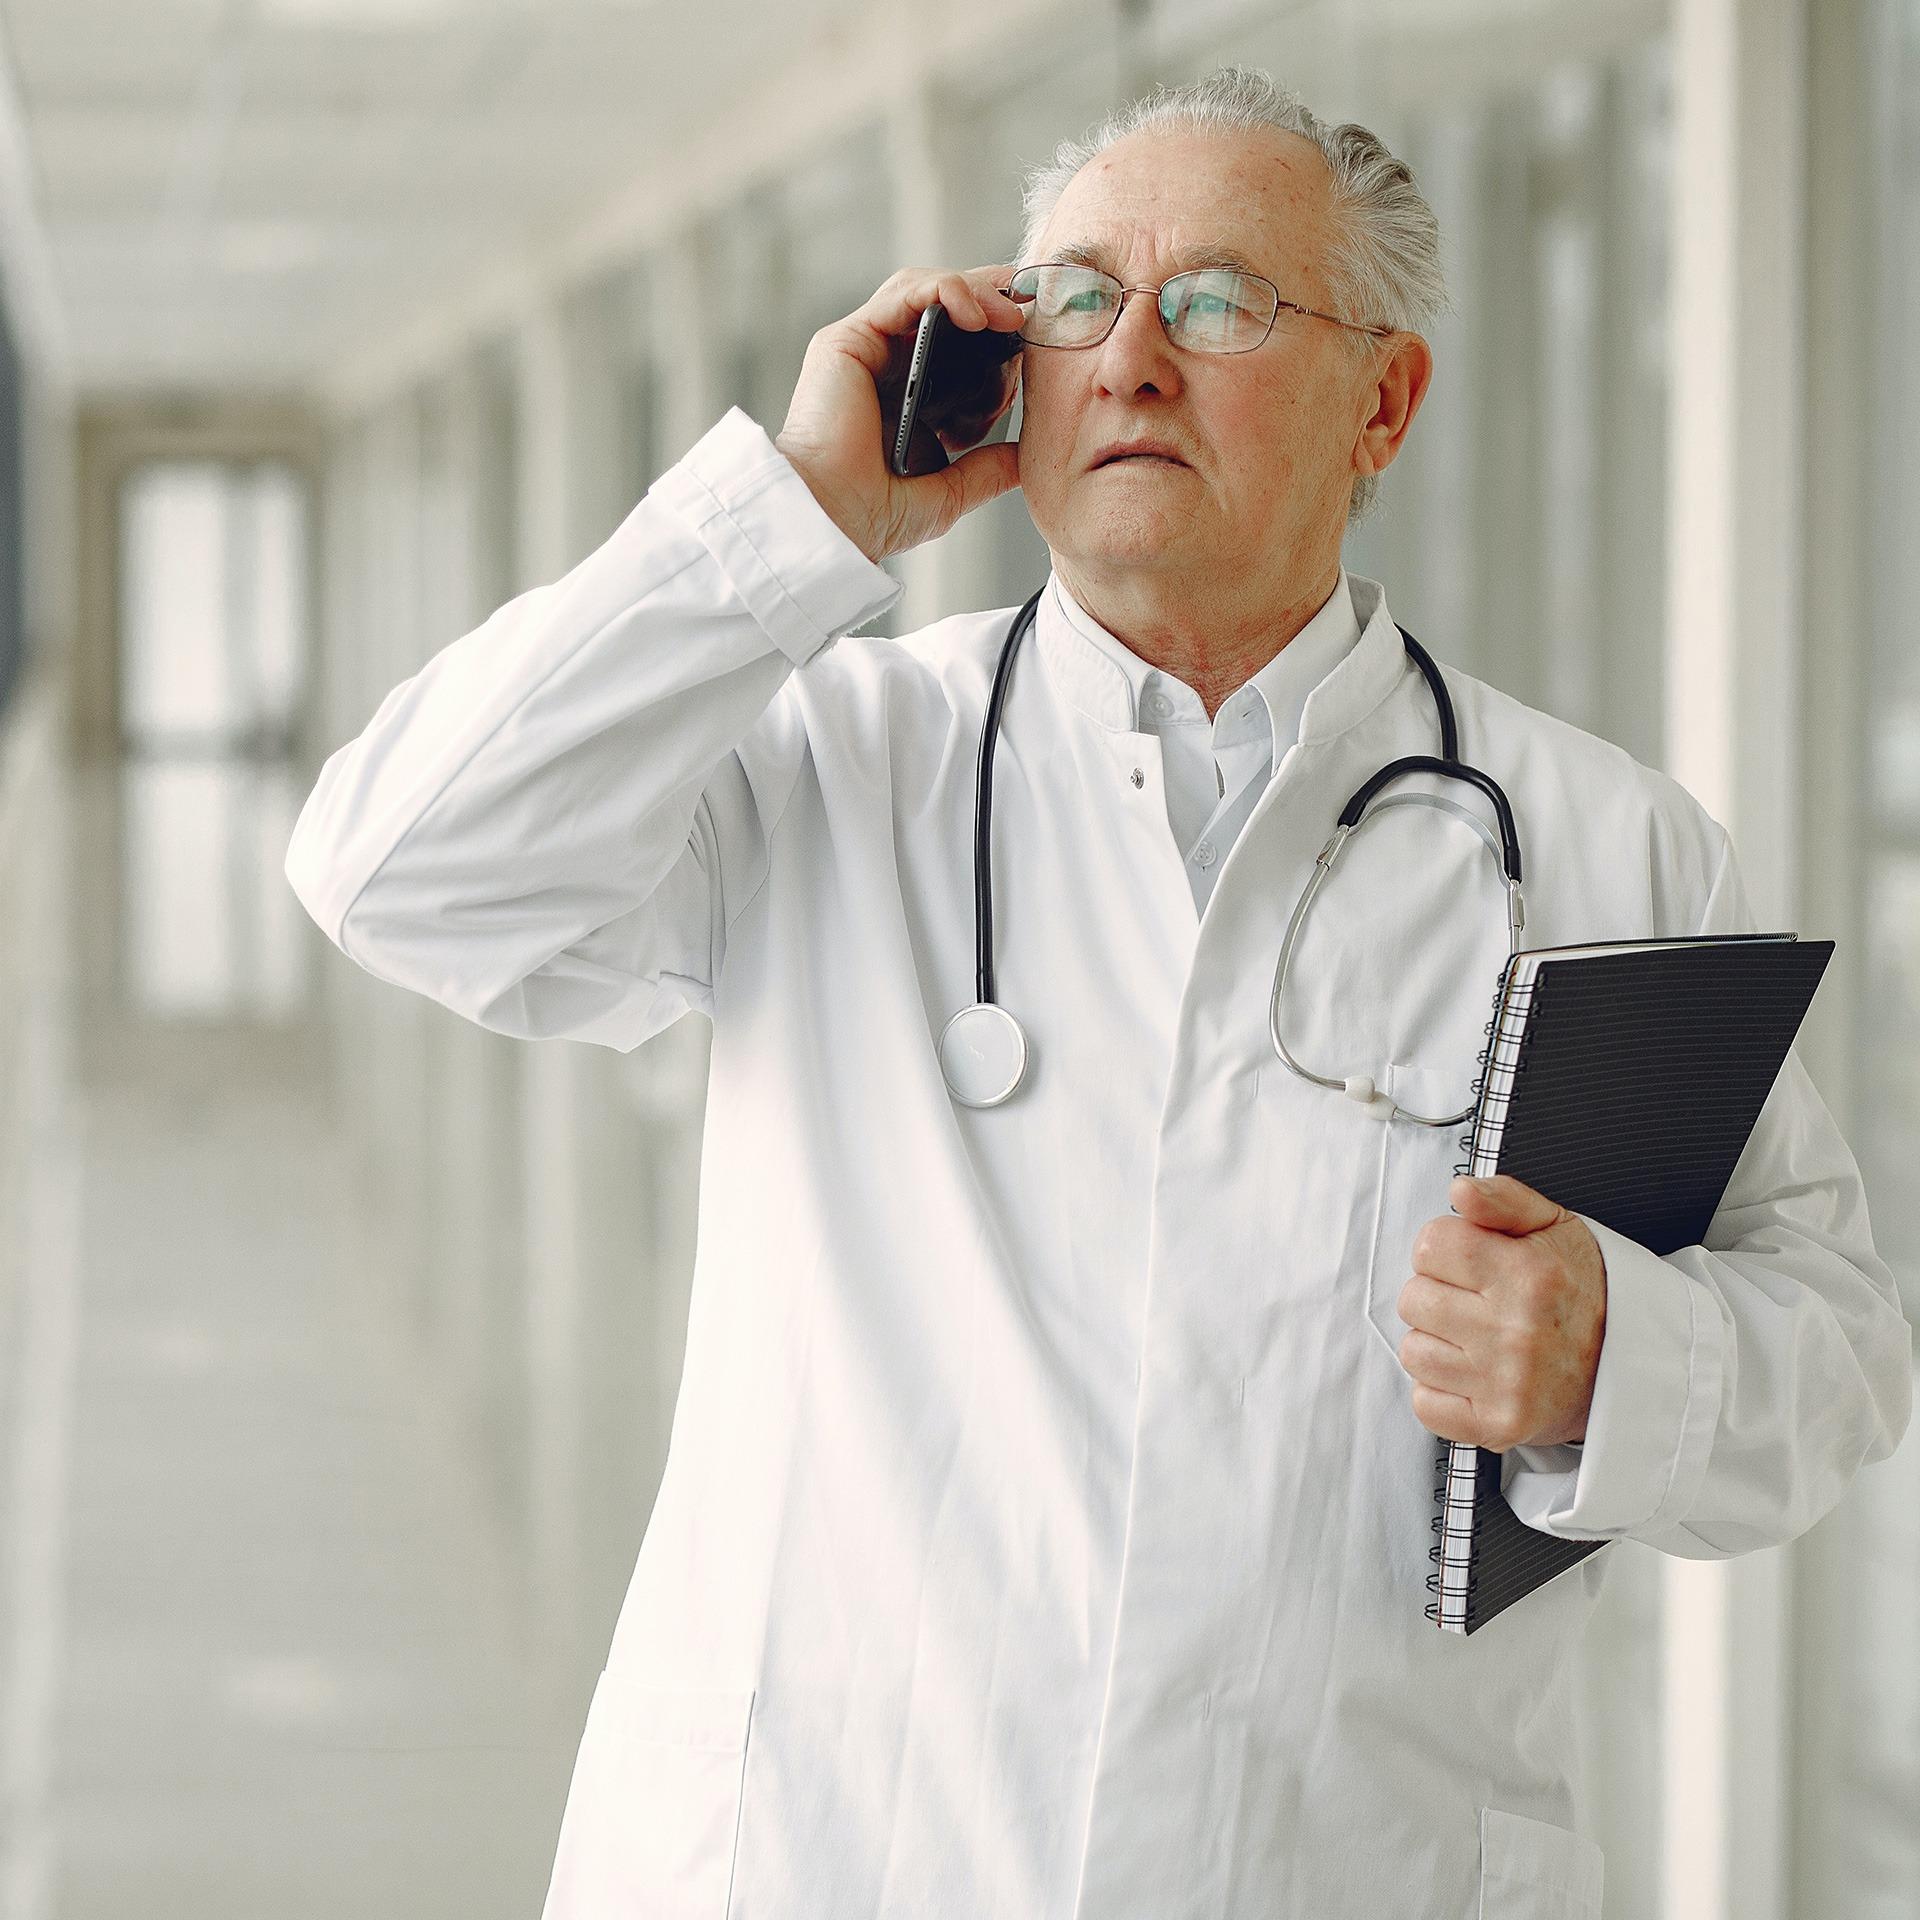 medicare-advantage-open-enrollment-deadline